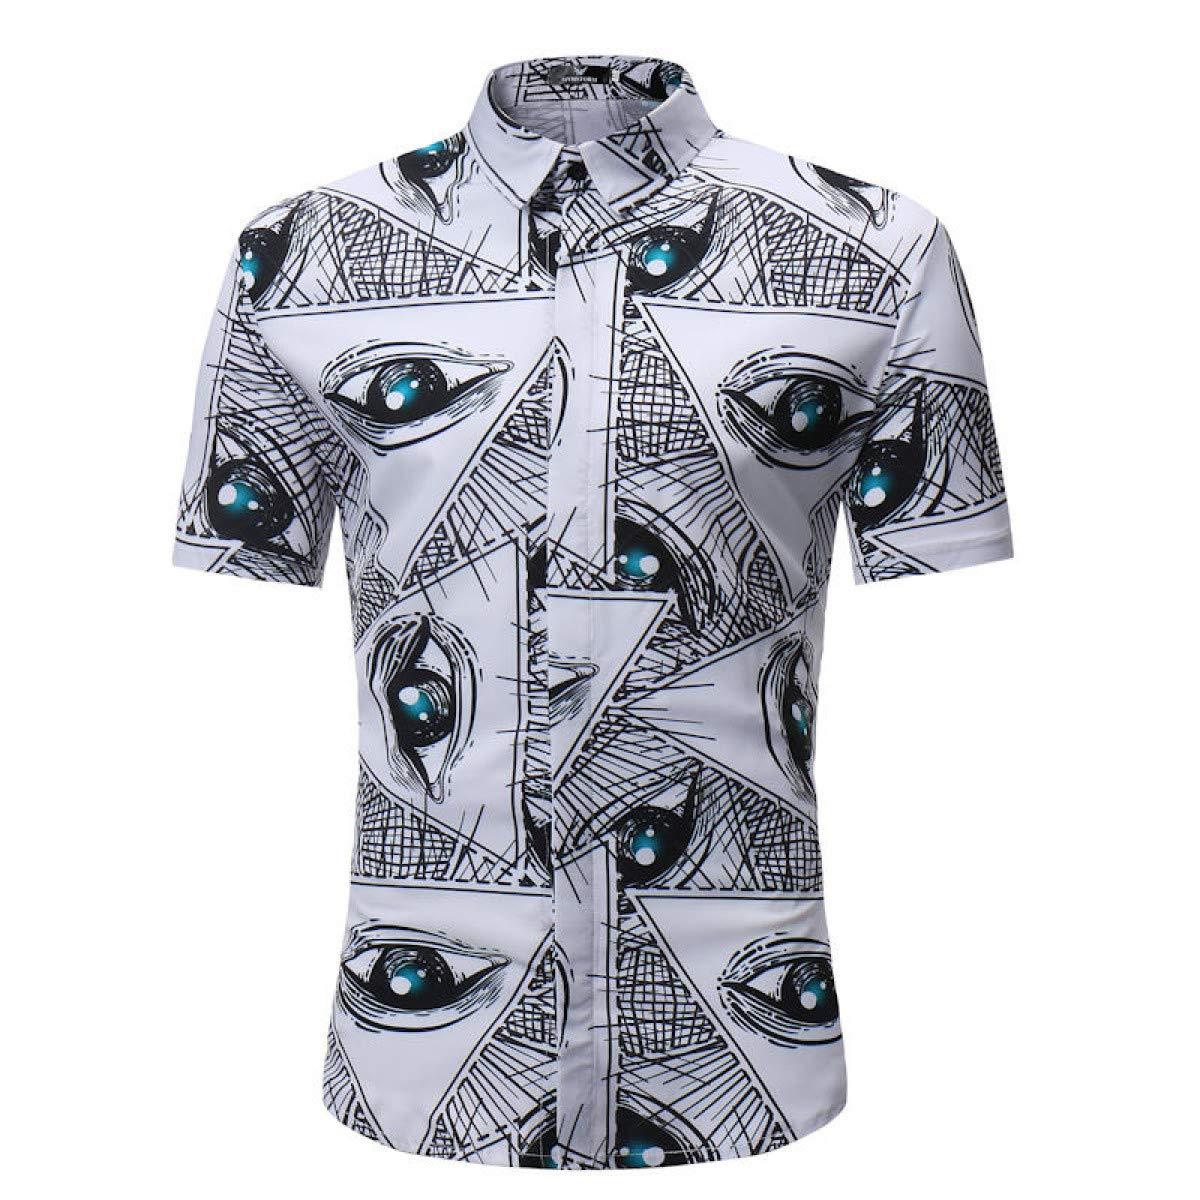 Aloha Shirt Men Men Shirt Summer Style Palm Tree Print Shirt Men Casual Short Sleeve Shirt